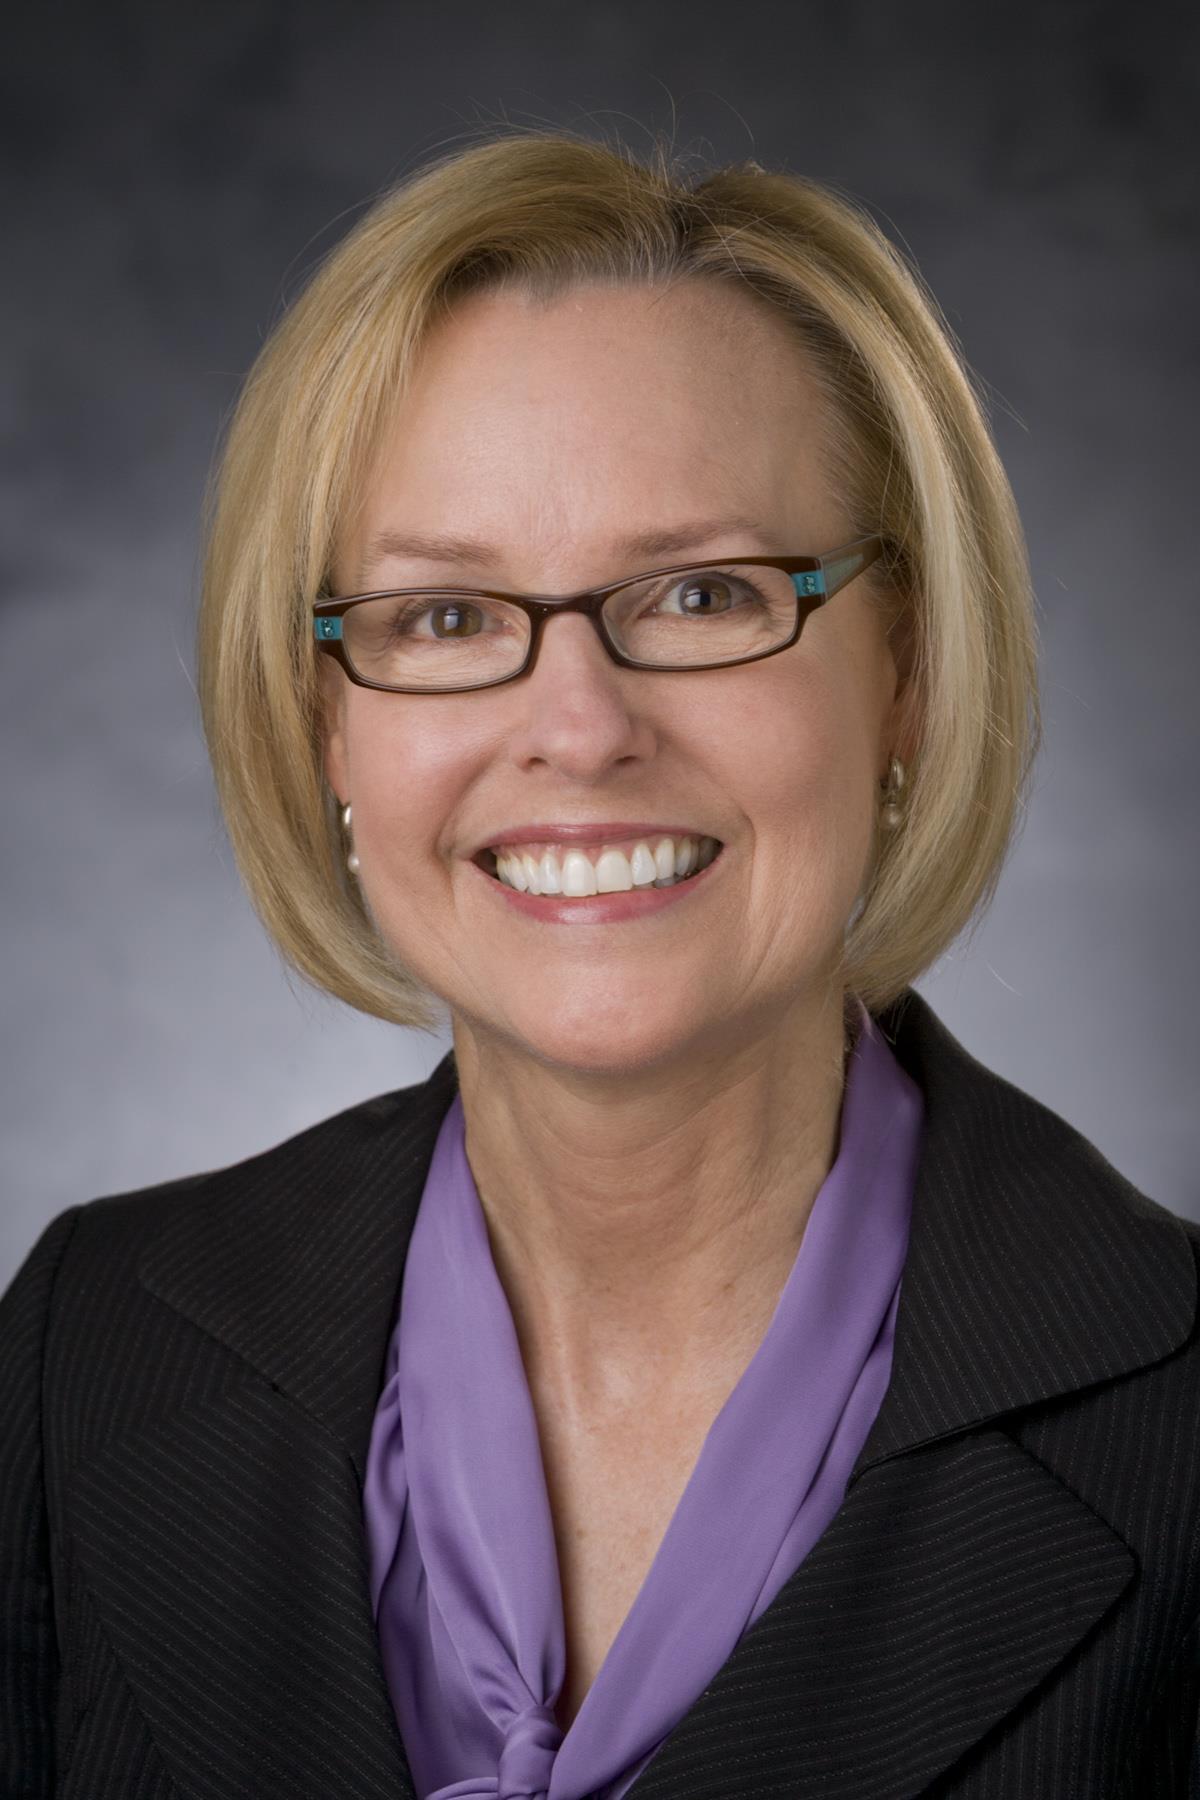 Geraldine Dawson, Ph.D.